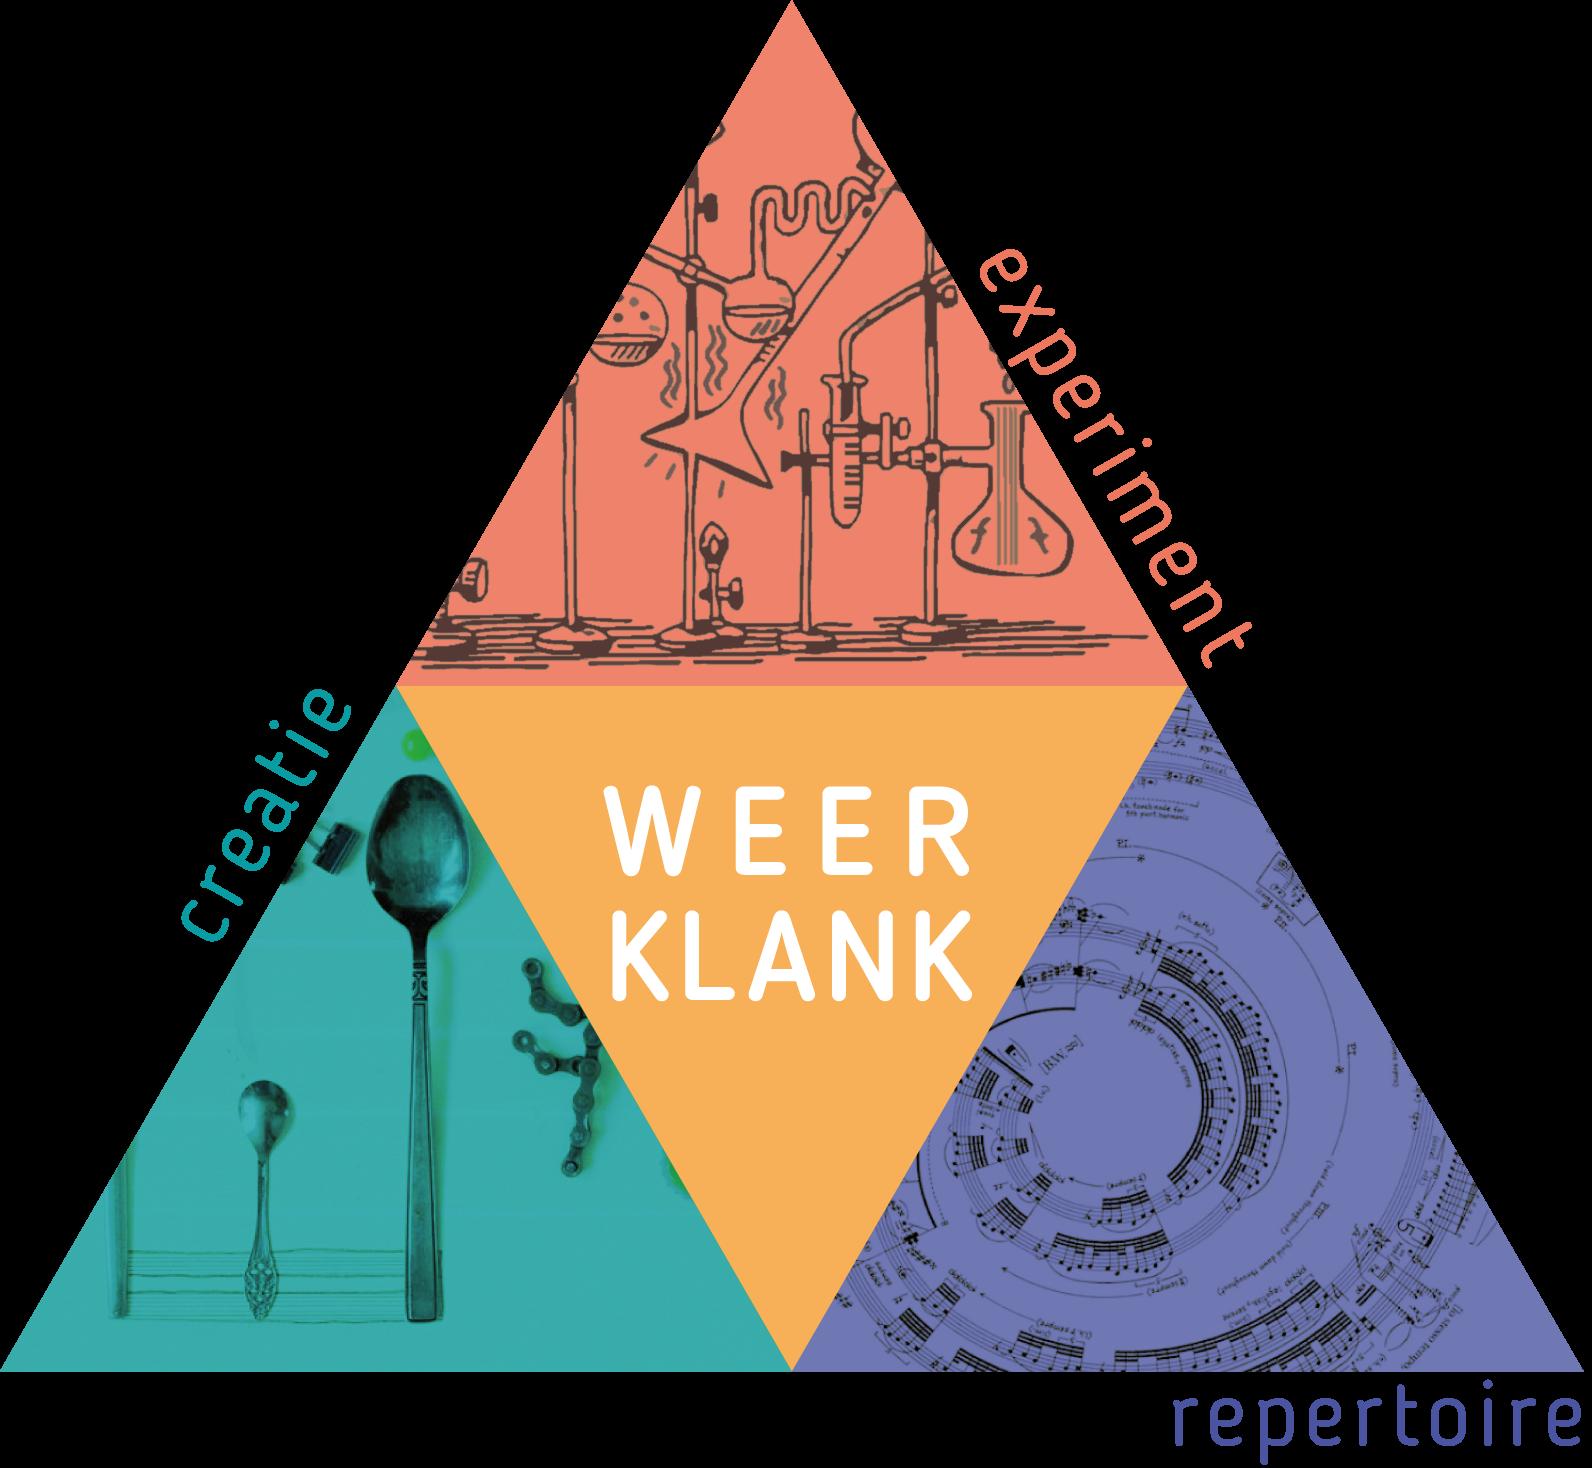 Weerklank - beeld transparante achtergrond